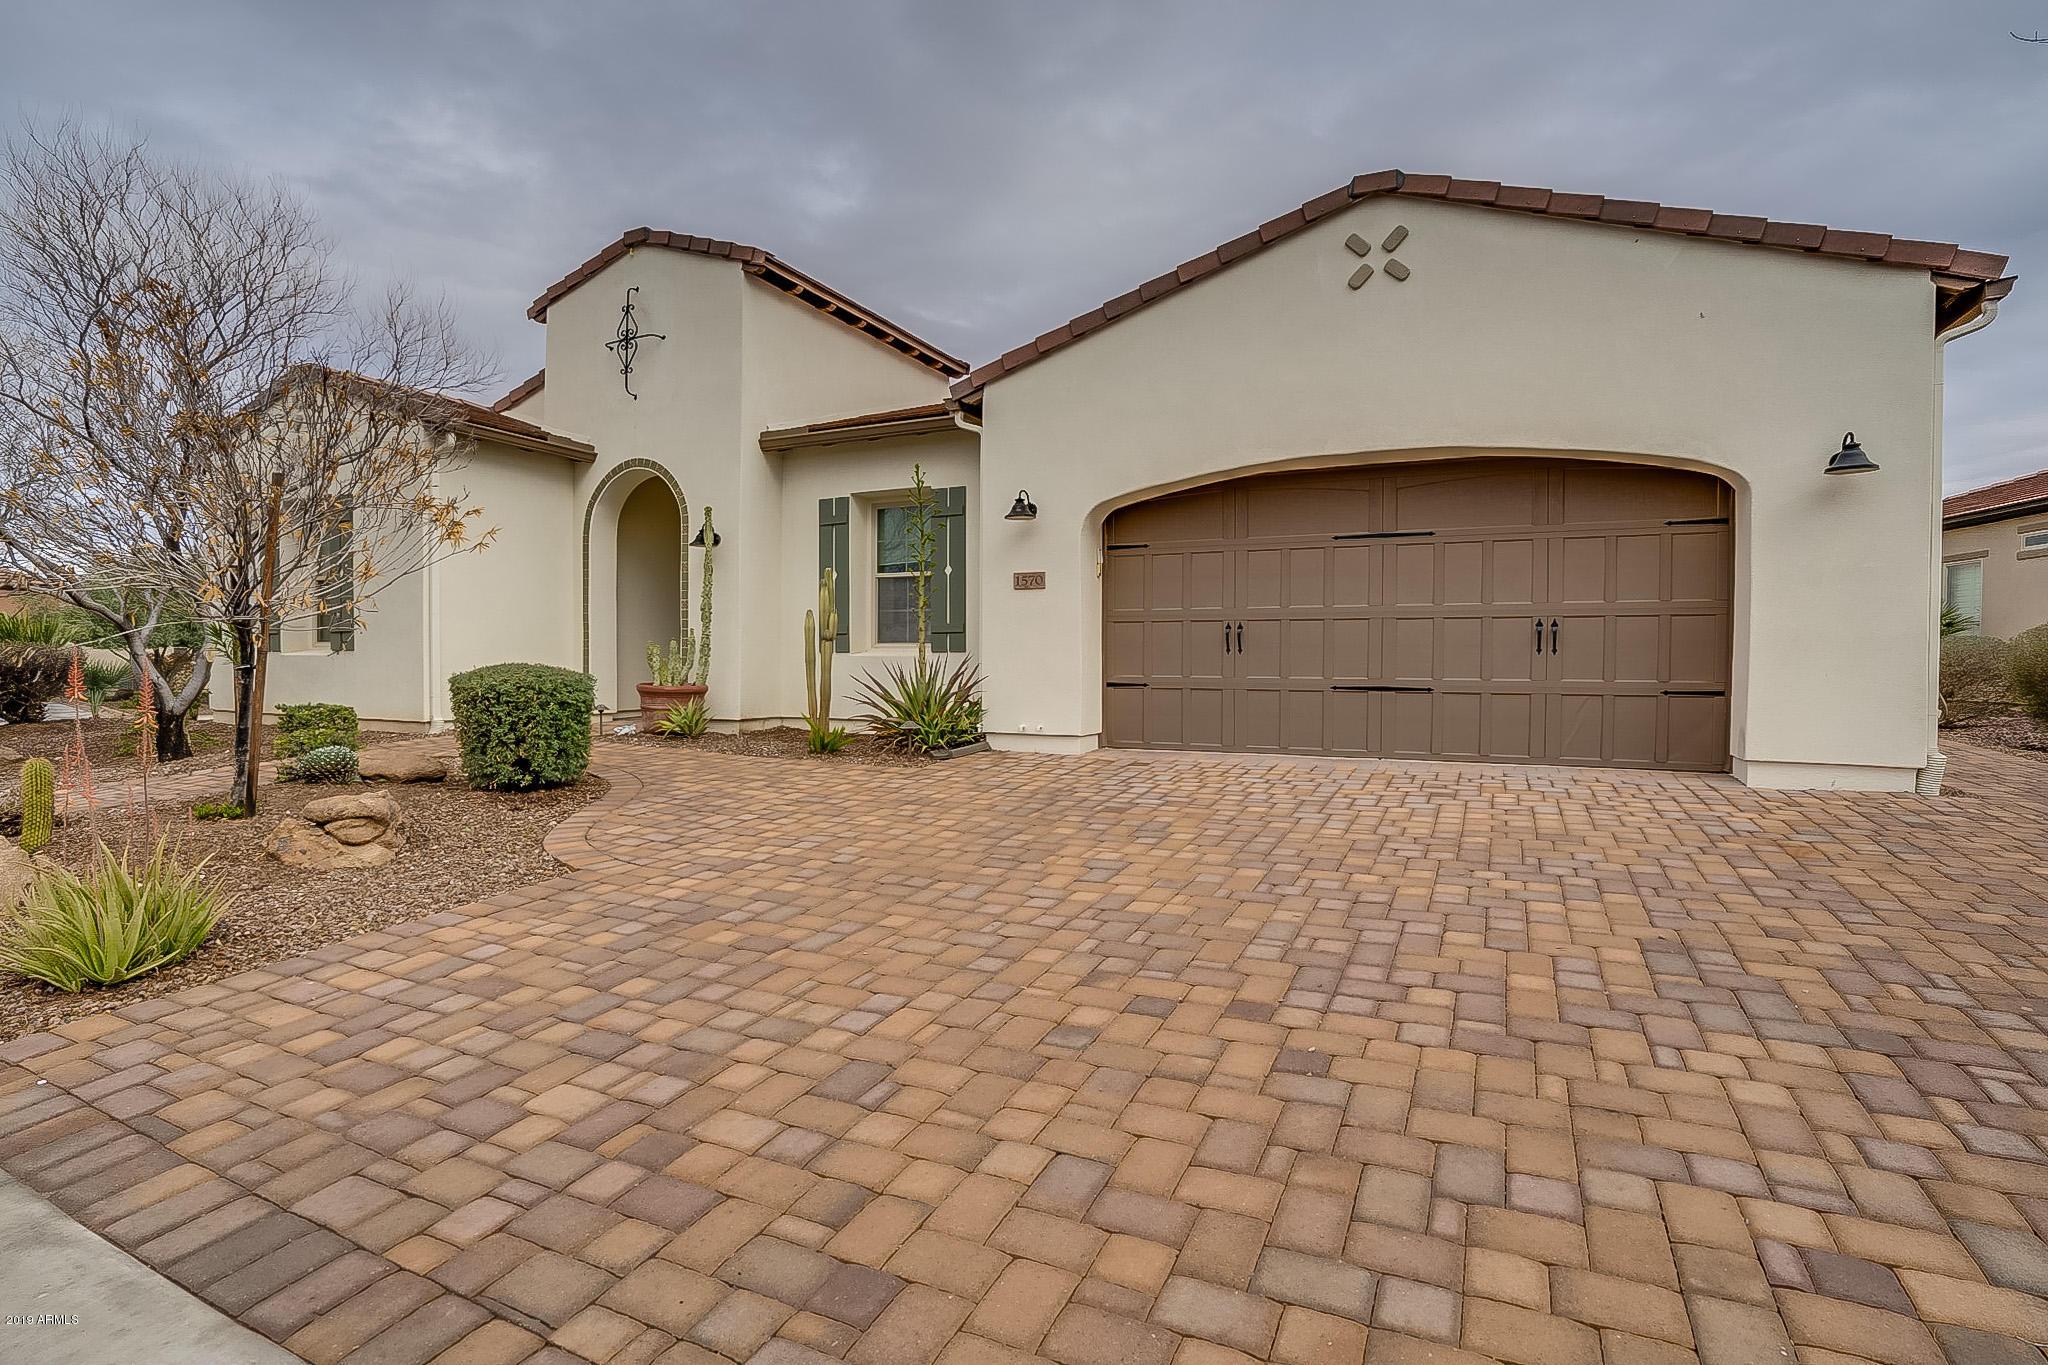 Photo of 1570 E Sattoo Way, San Tan Valley, AZ 85140